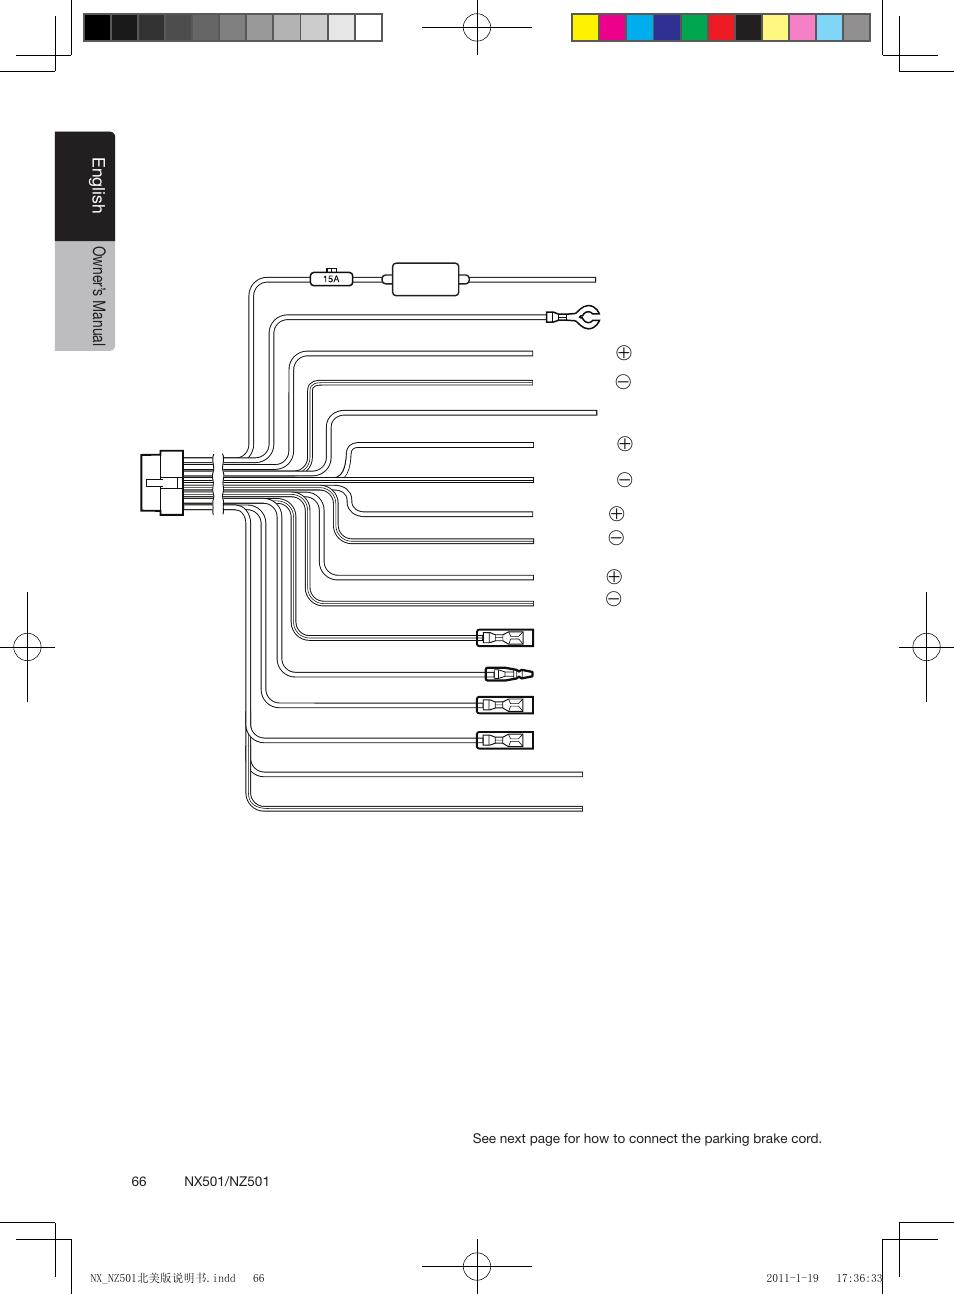 [DIAGRAM] Clarion Vz401 Wiring Diagrams FULL Version HD